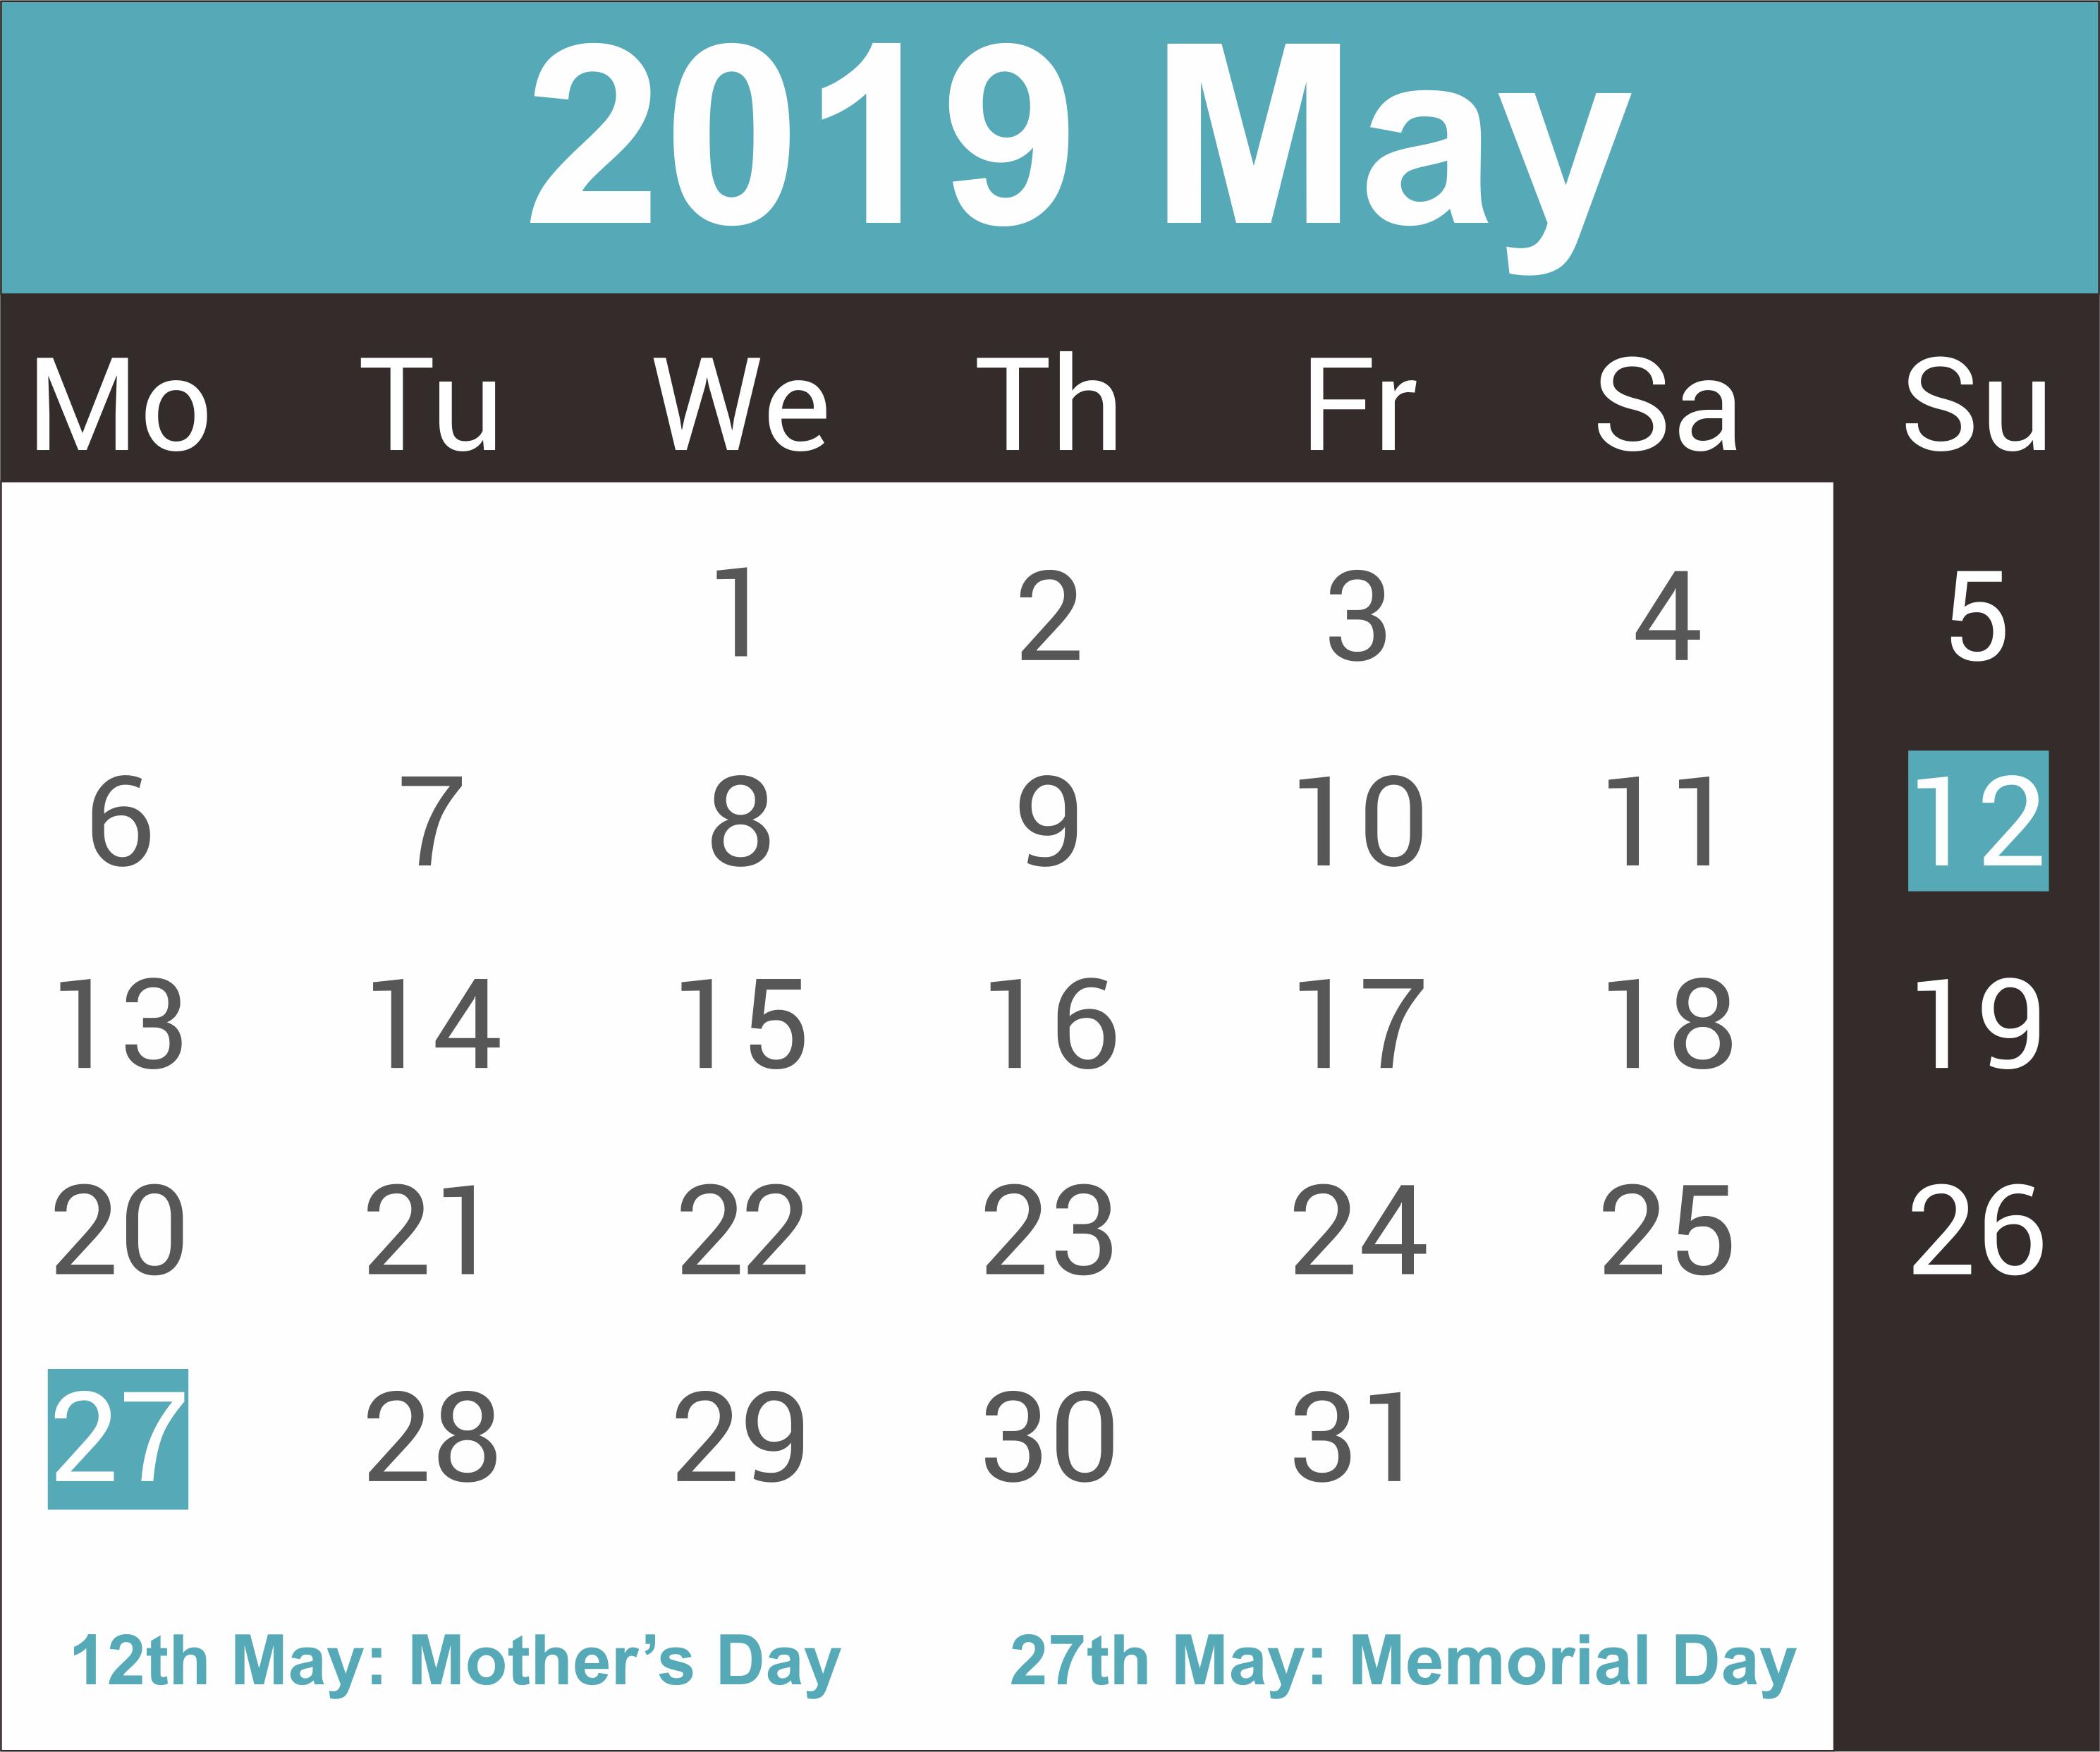 Printable May 2019 Calendar - Free Printable Calendar, Templates And May 2 2019 Calendar